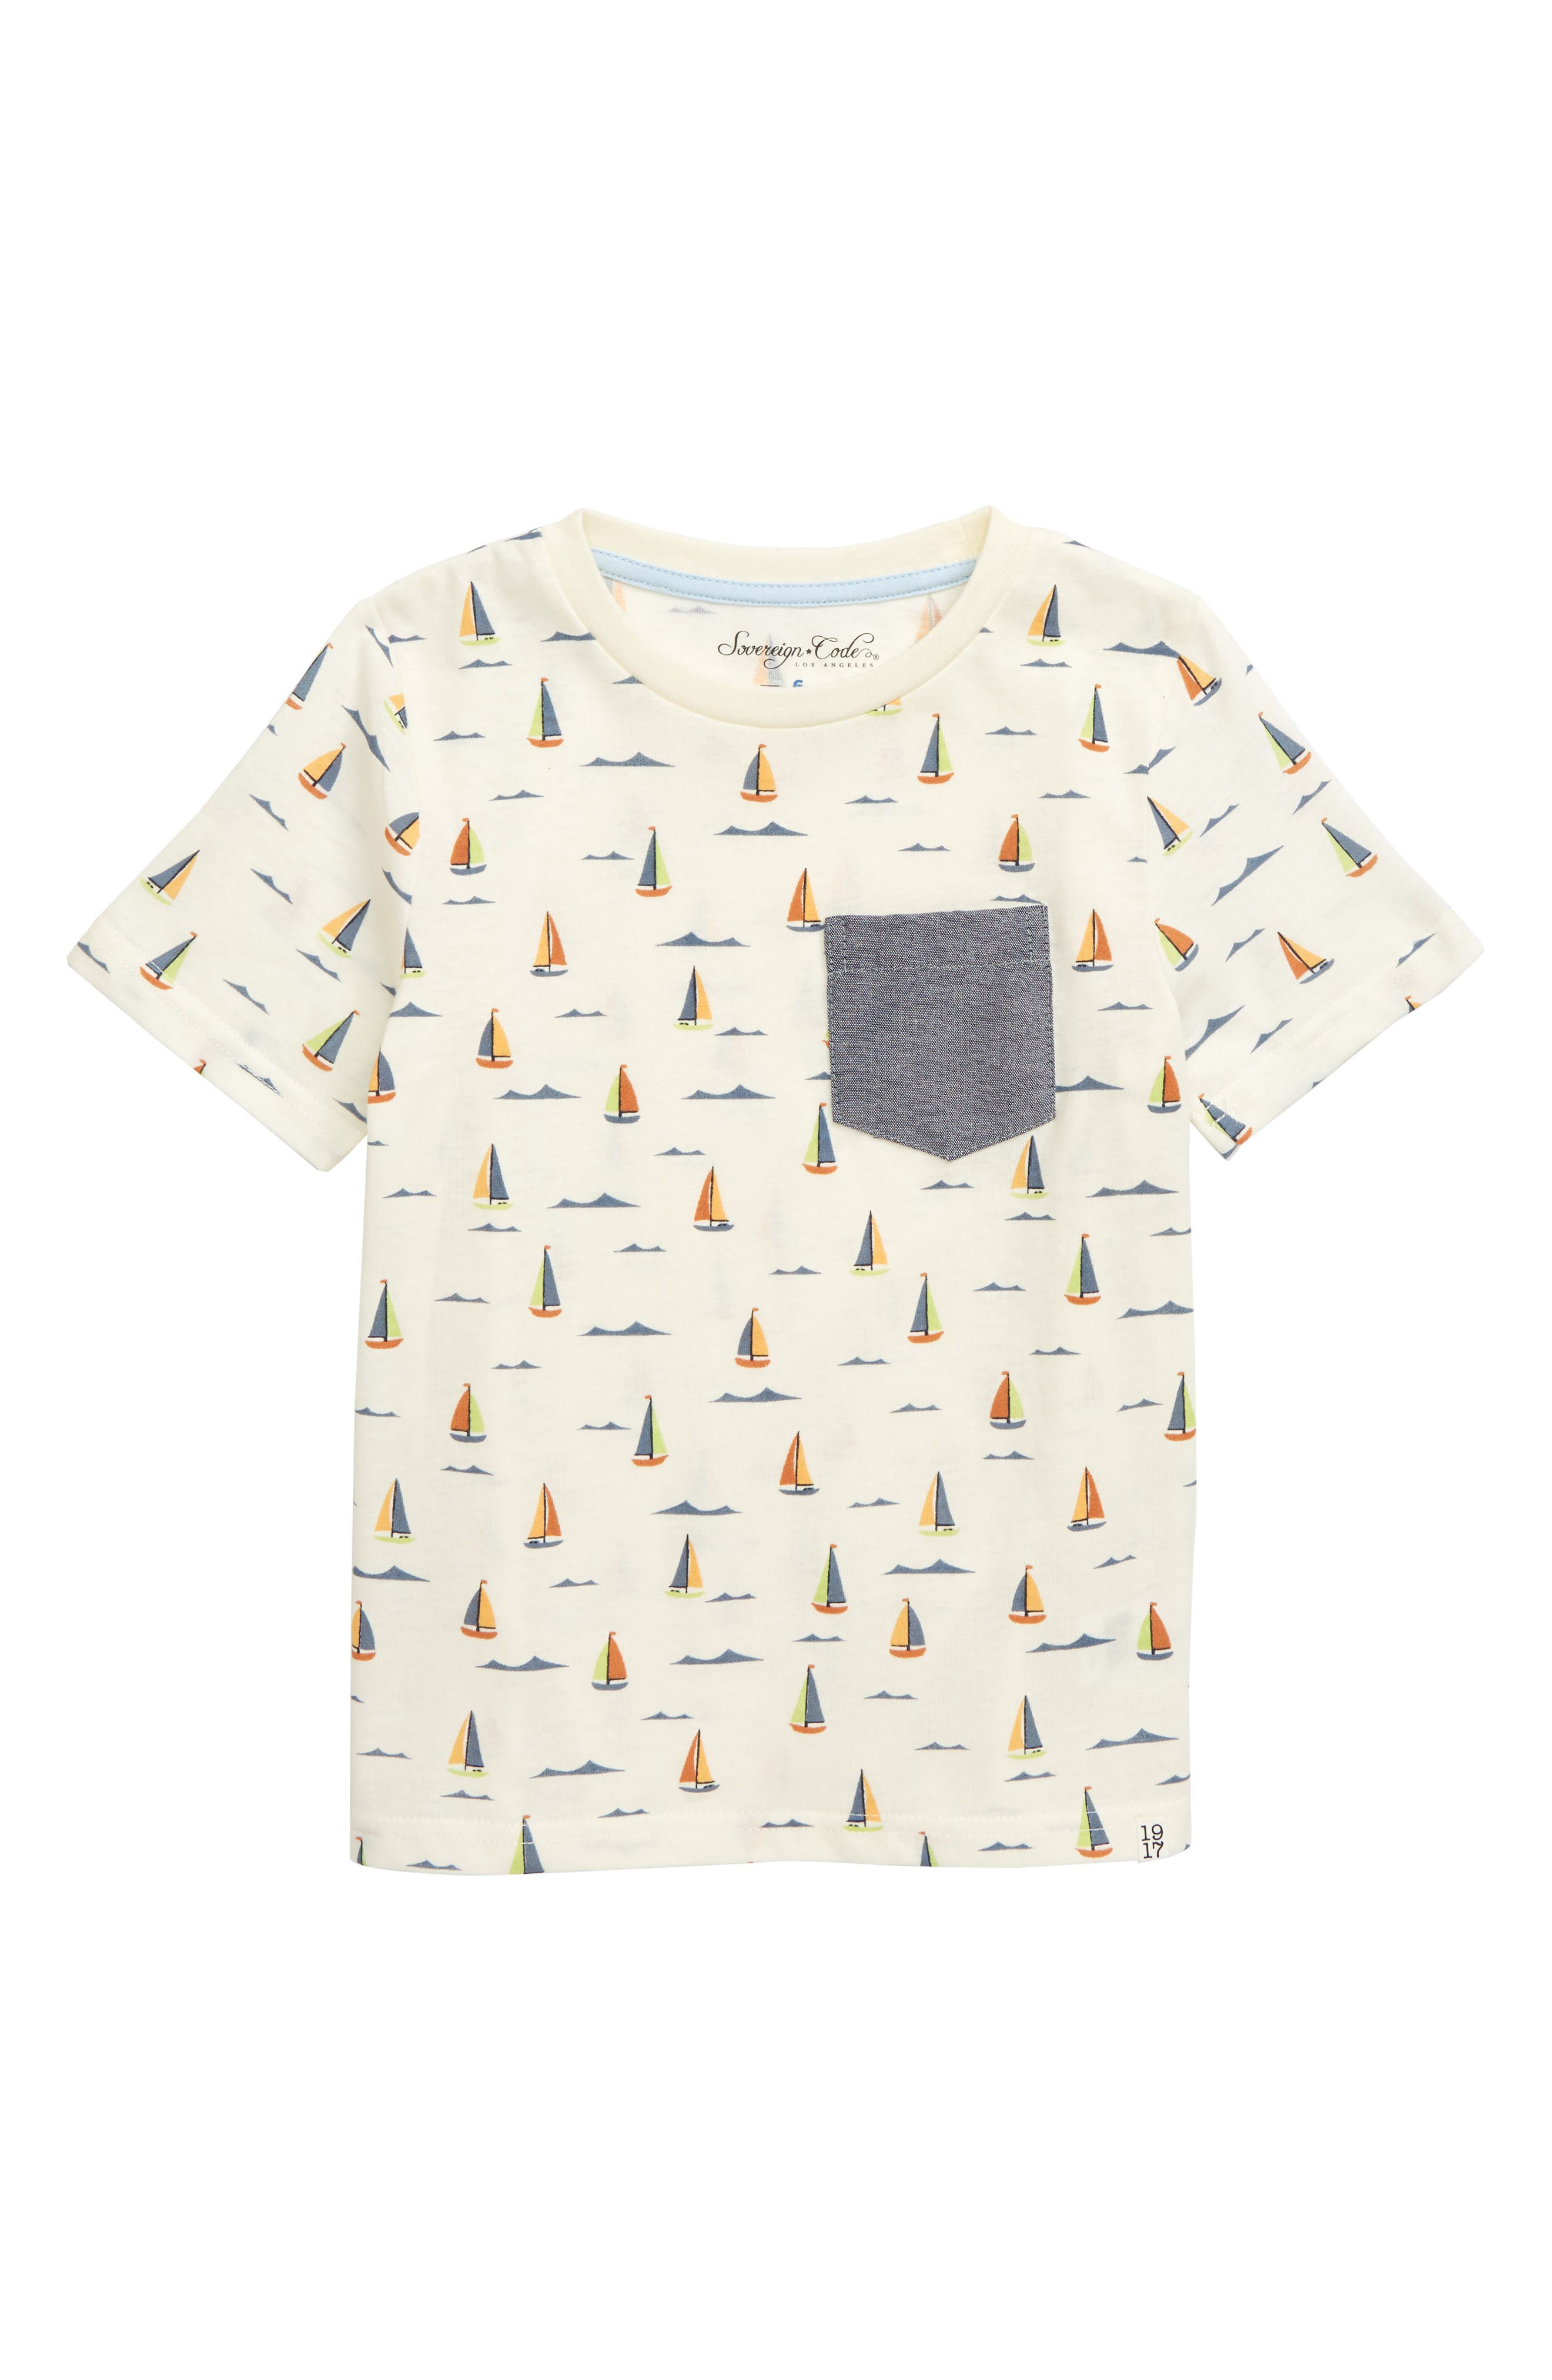 Boys Sovereign Code Sailboat Waves TShirt Size 6  Ivory